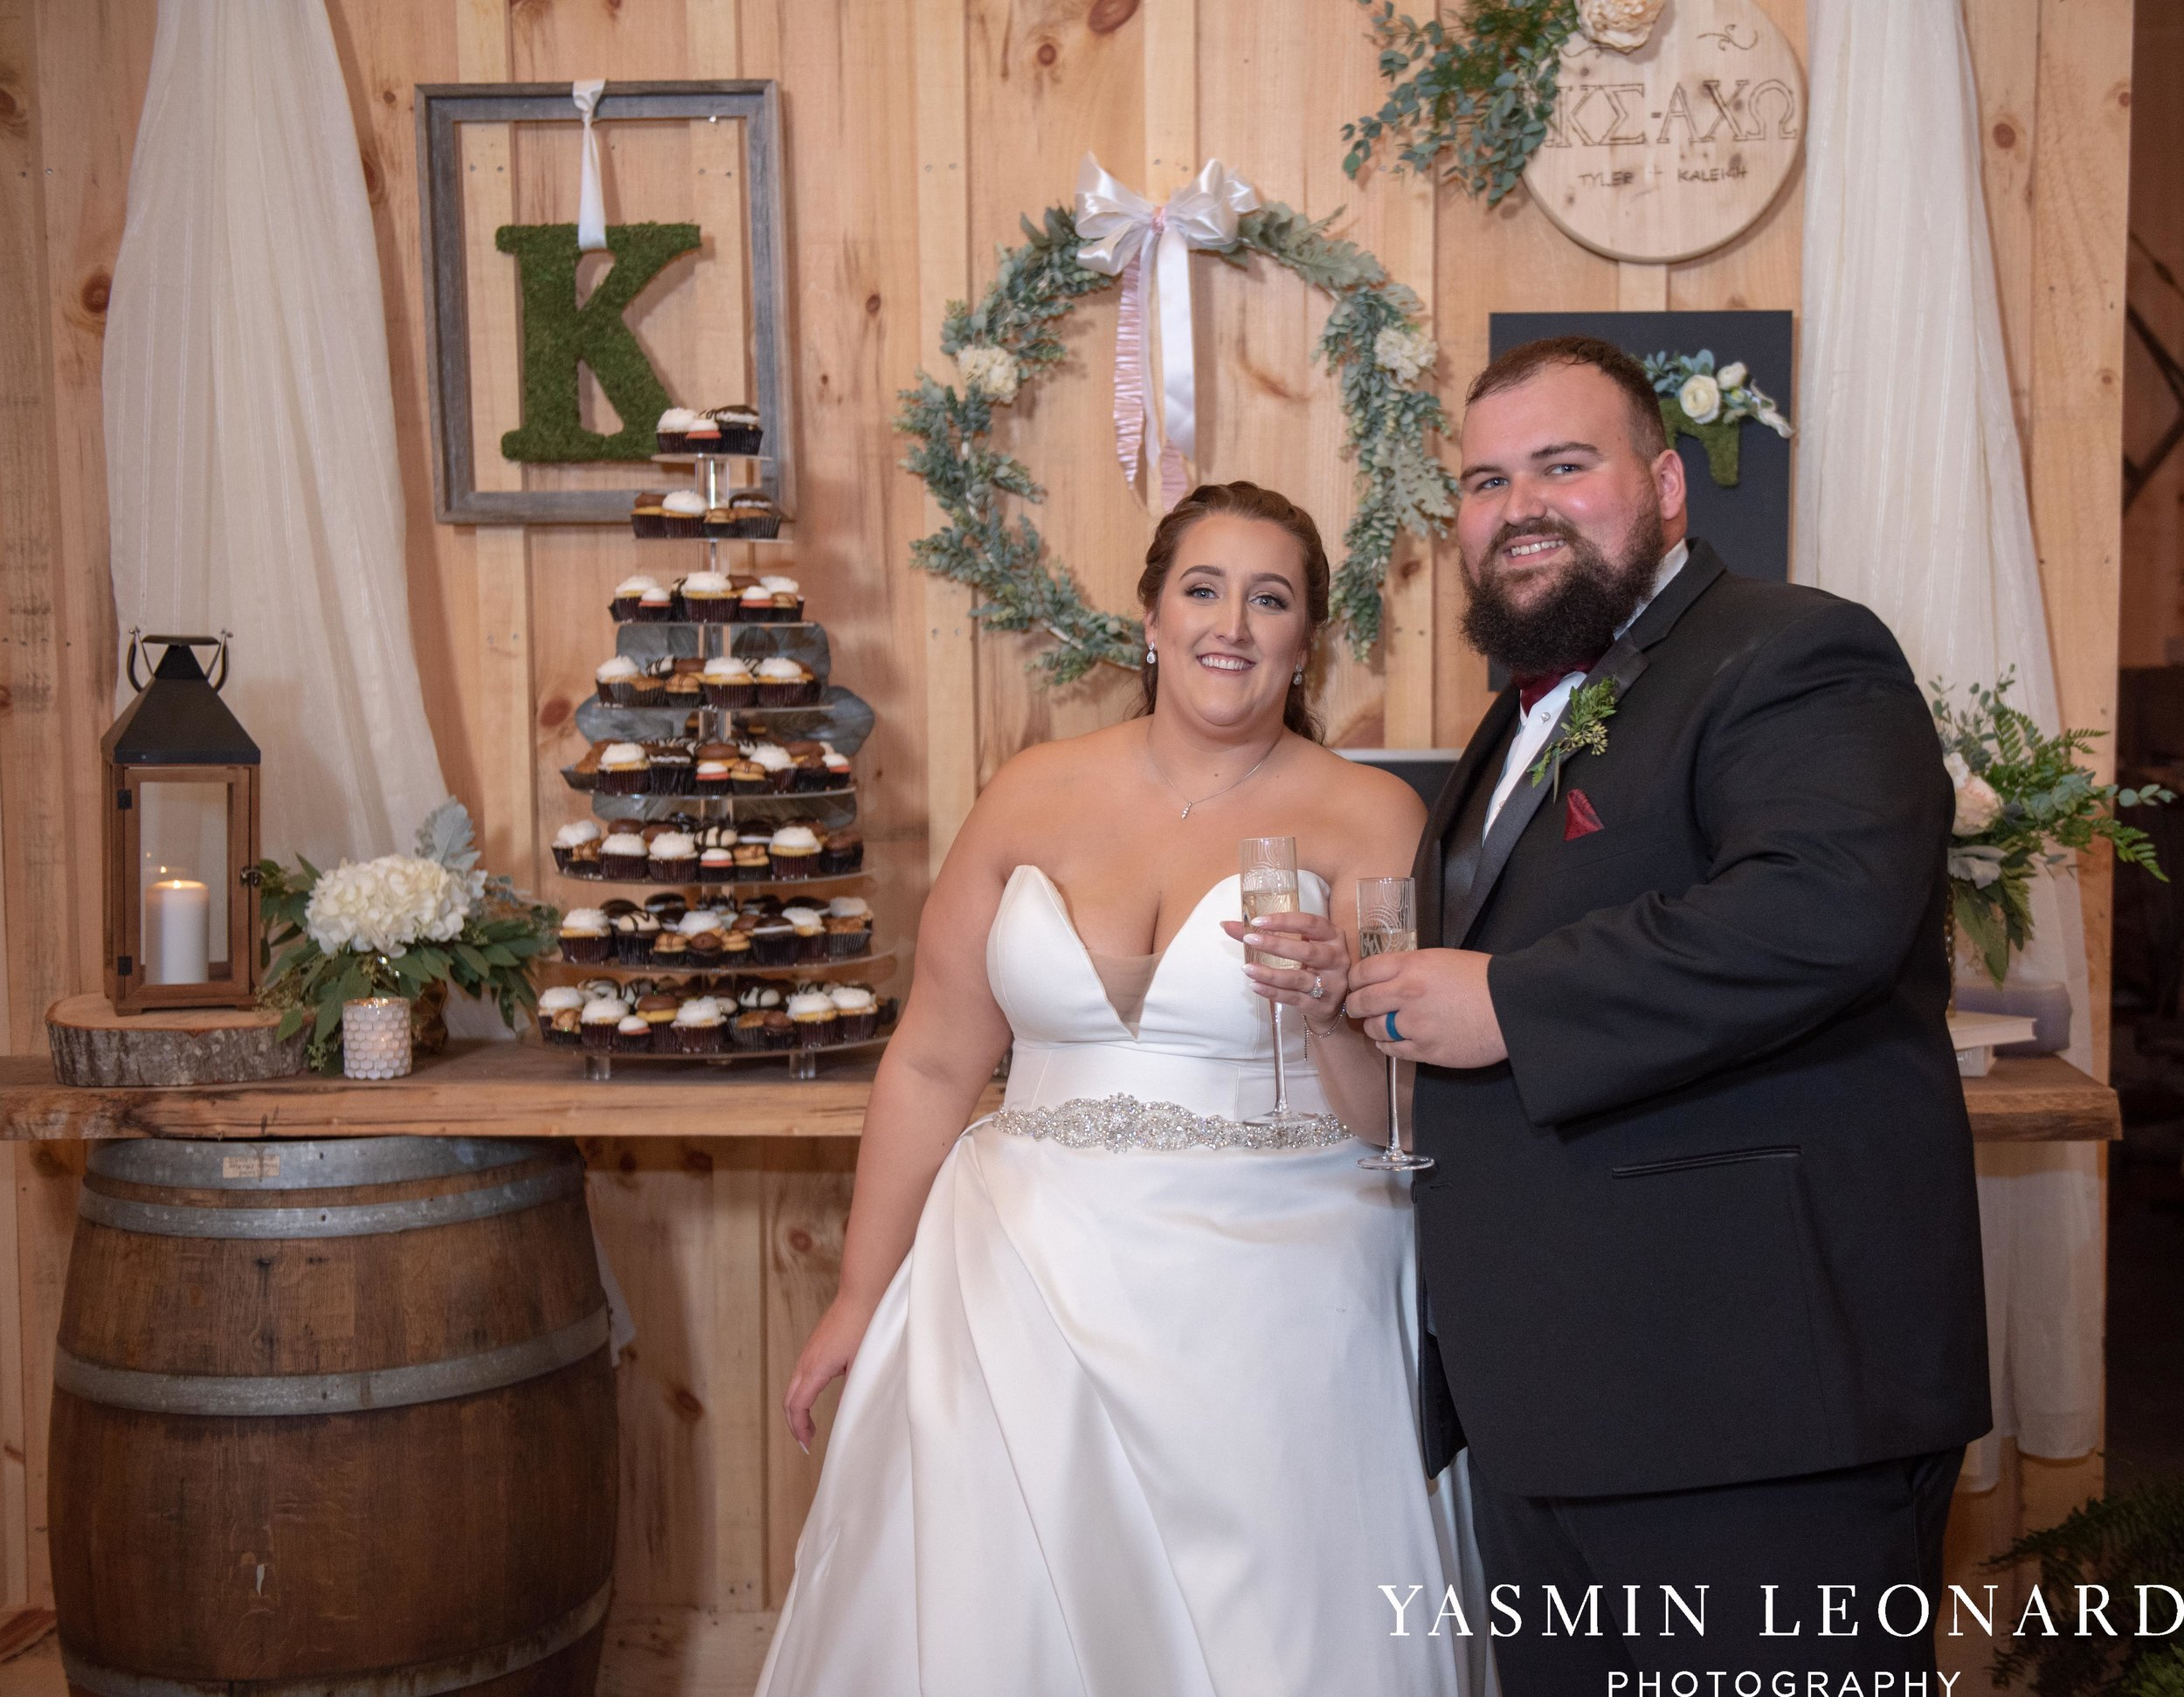 Wesley Memorial United Methodist Church - Old Homeplace Winery - High Point Weddings - High Point Wedding Photographer - NC Weddings - NC Barn Venue - Yasmin Leonard Photography-71.jpg